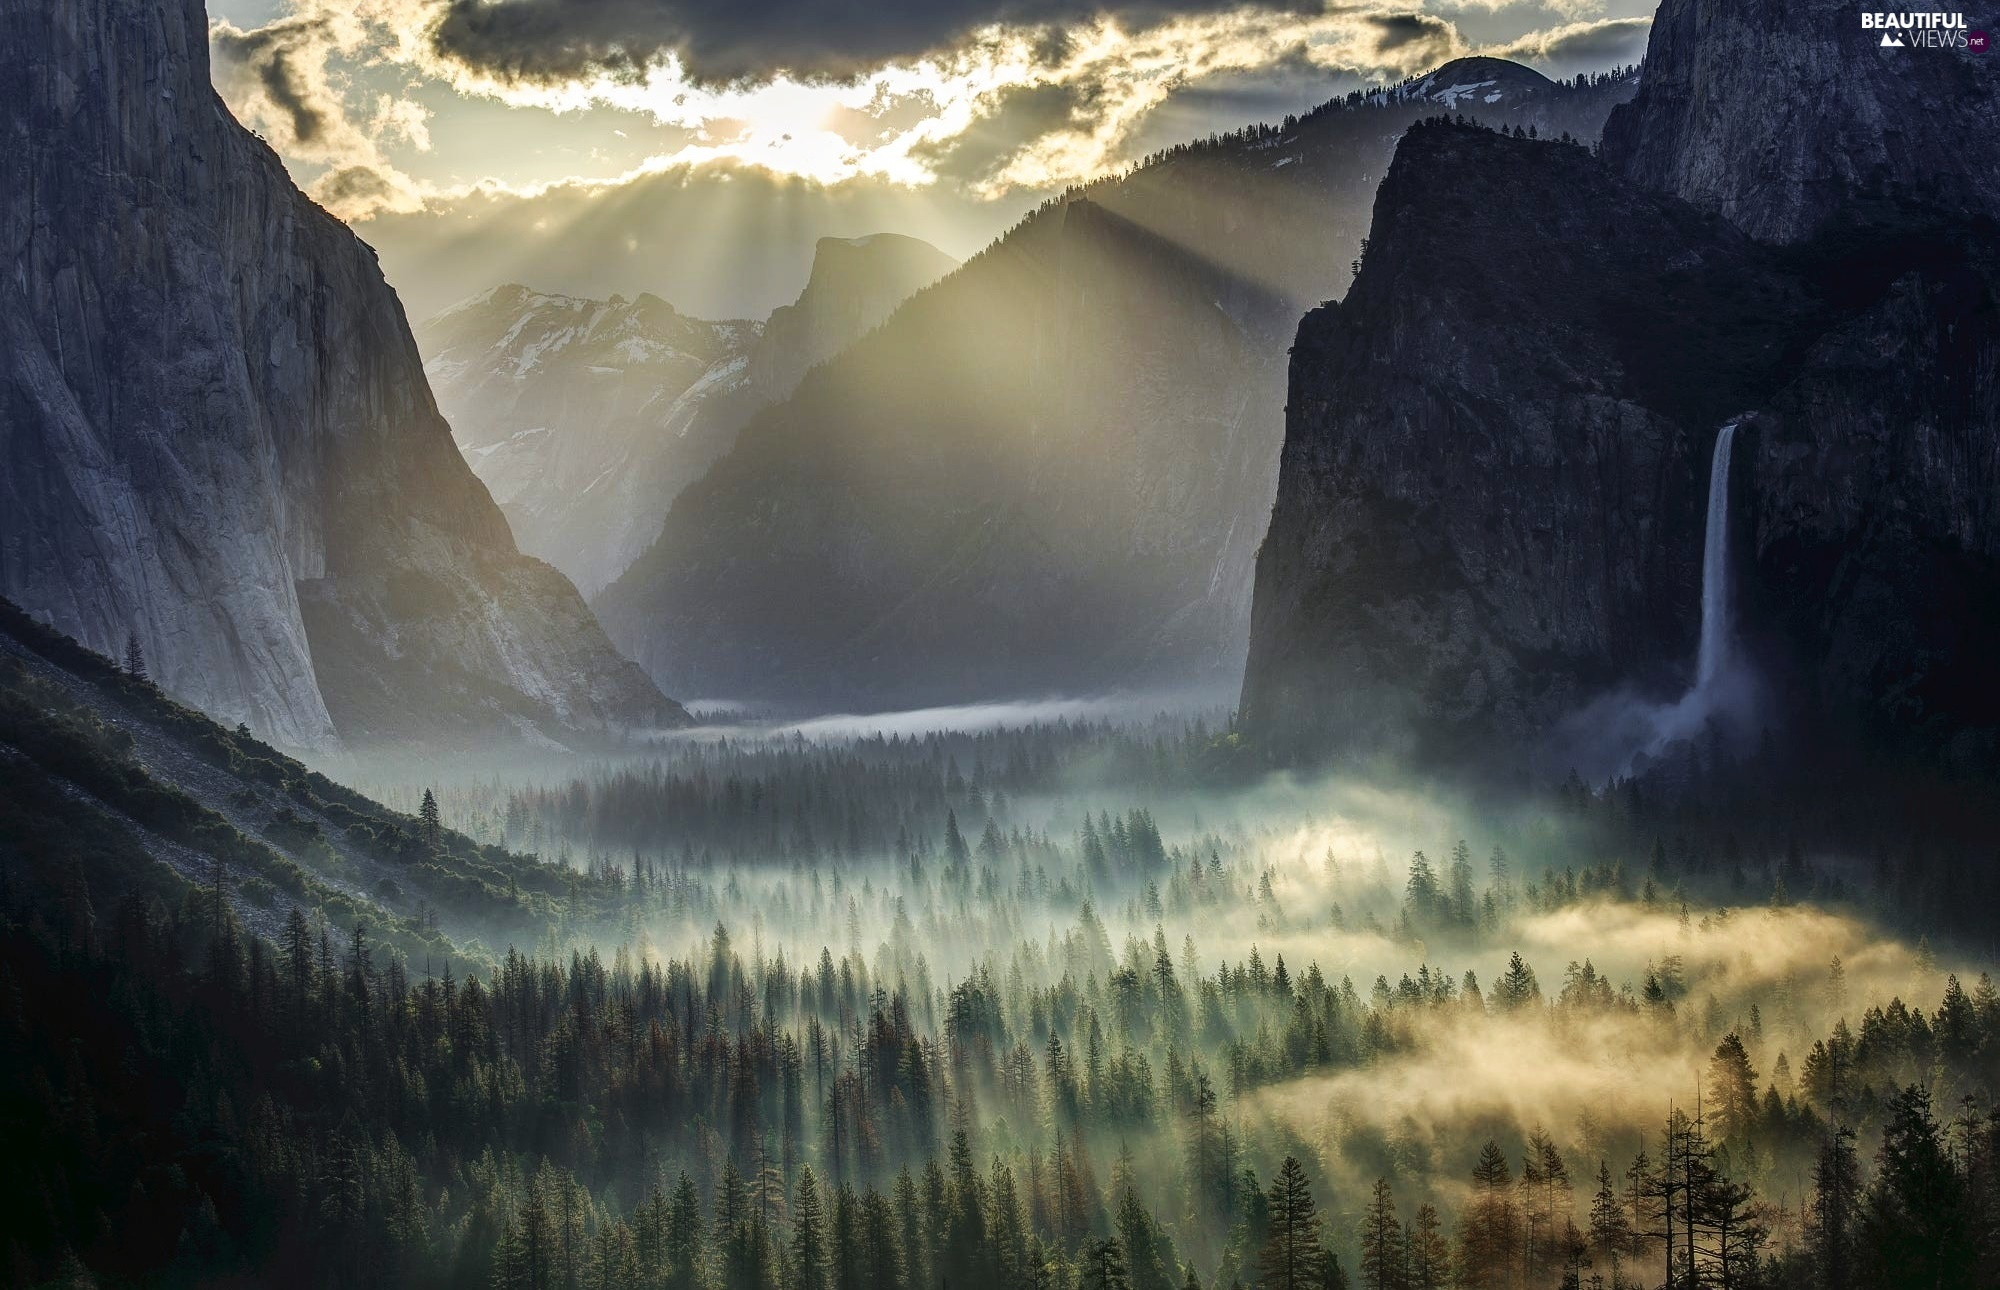 yosemite national park fog - photo #28